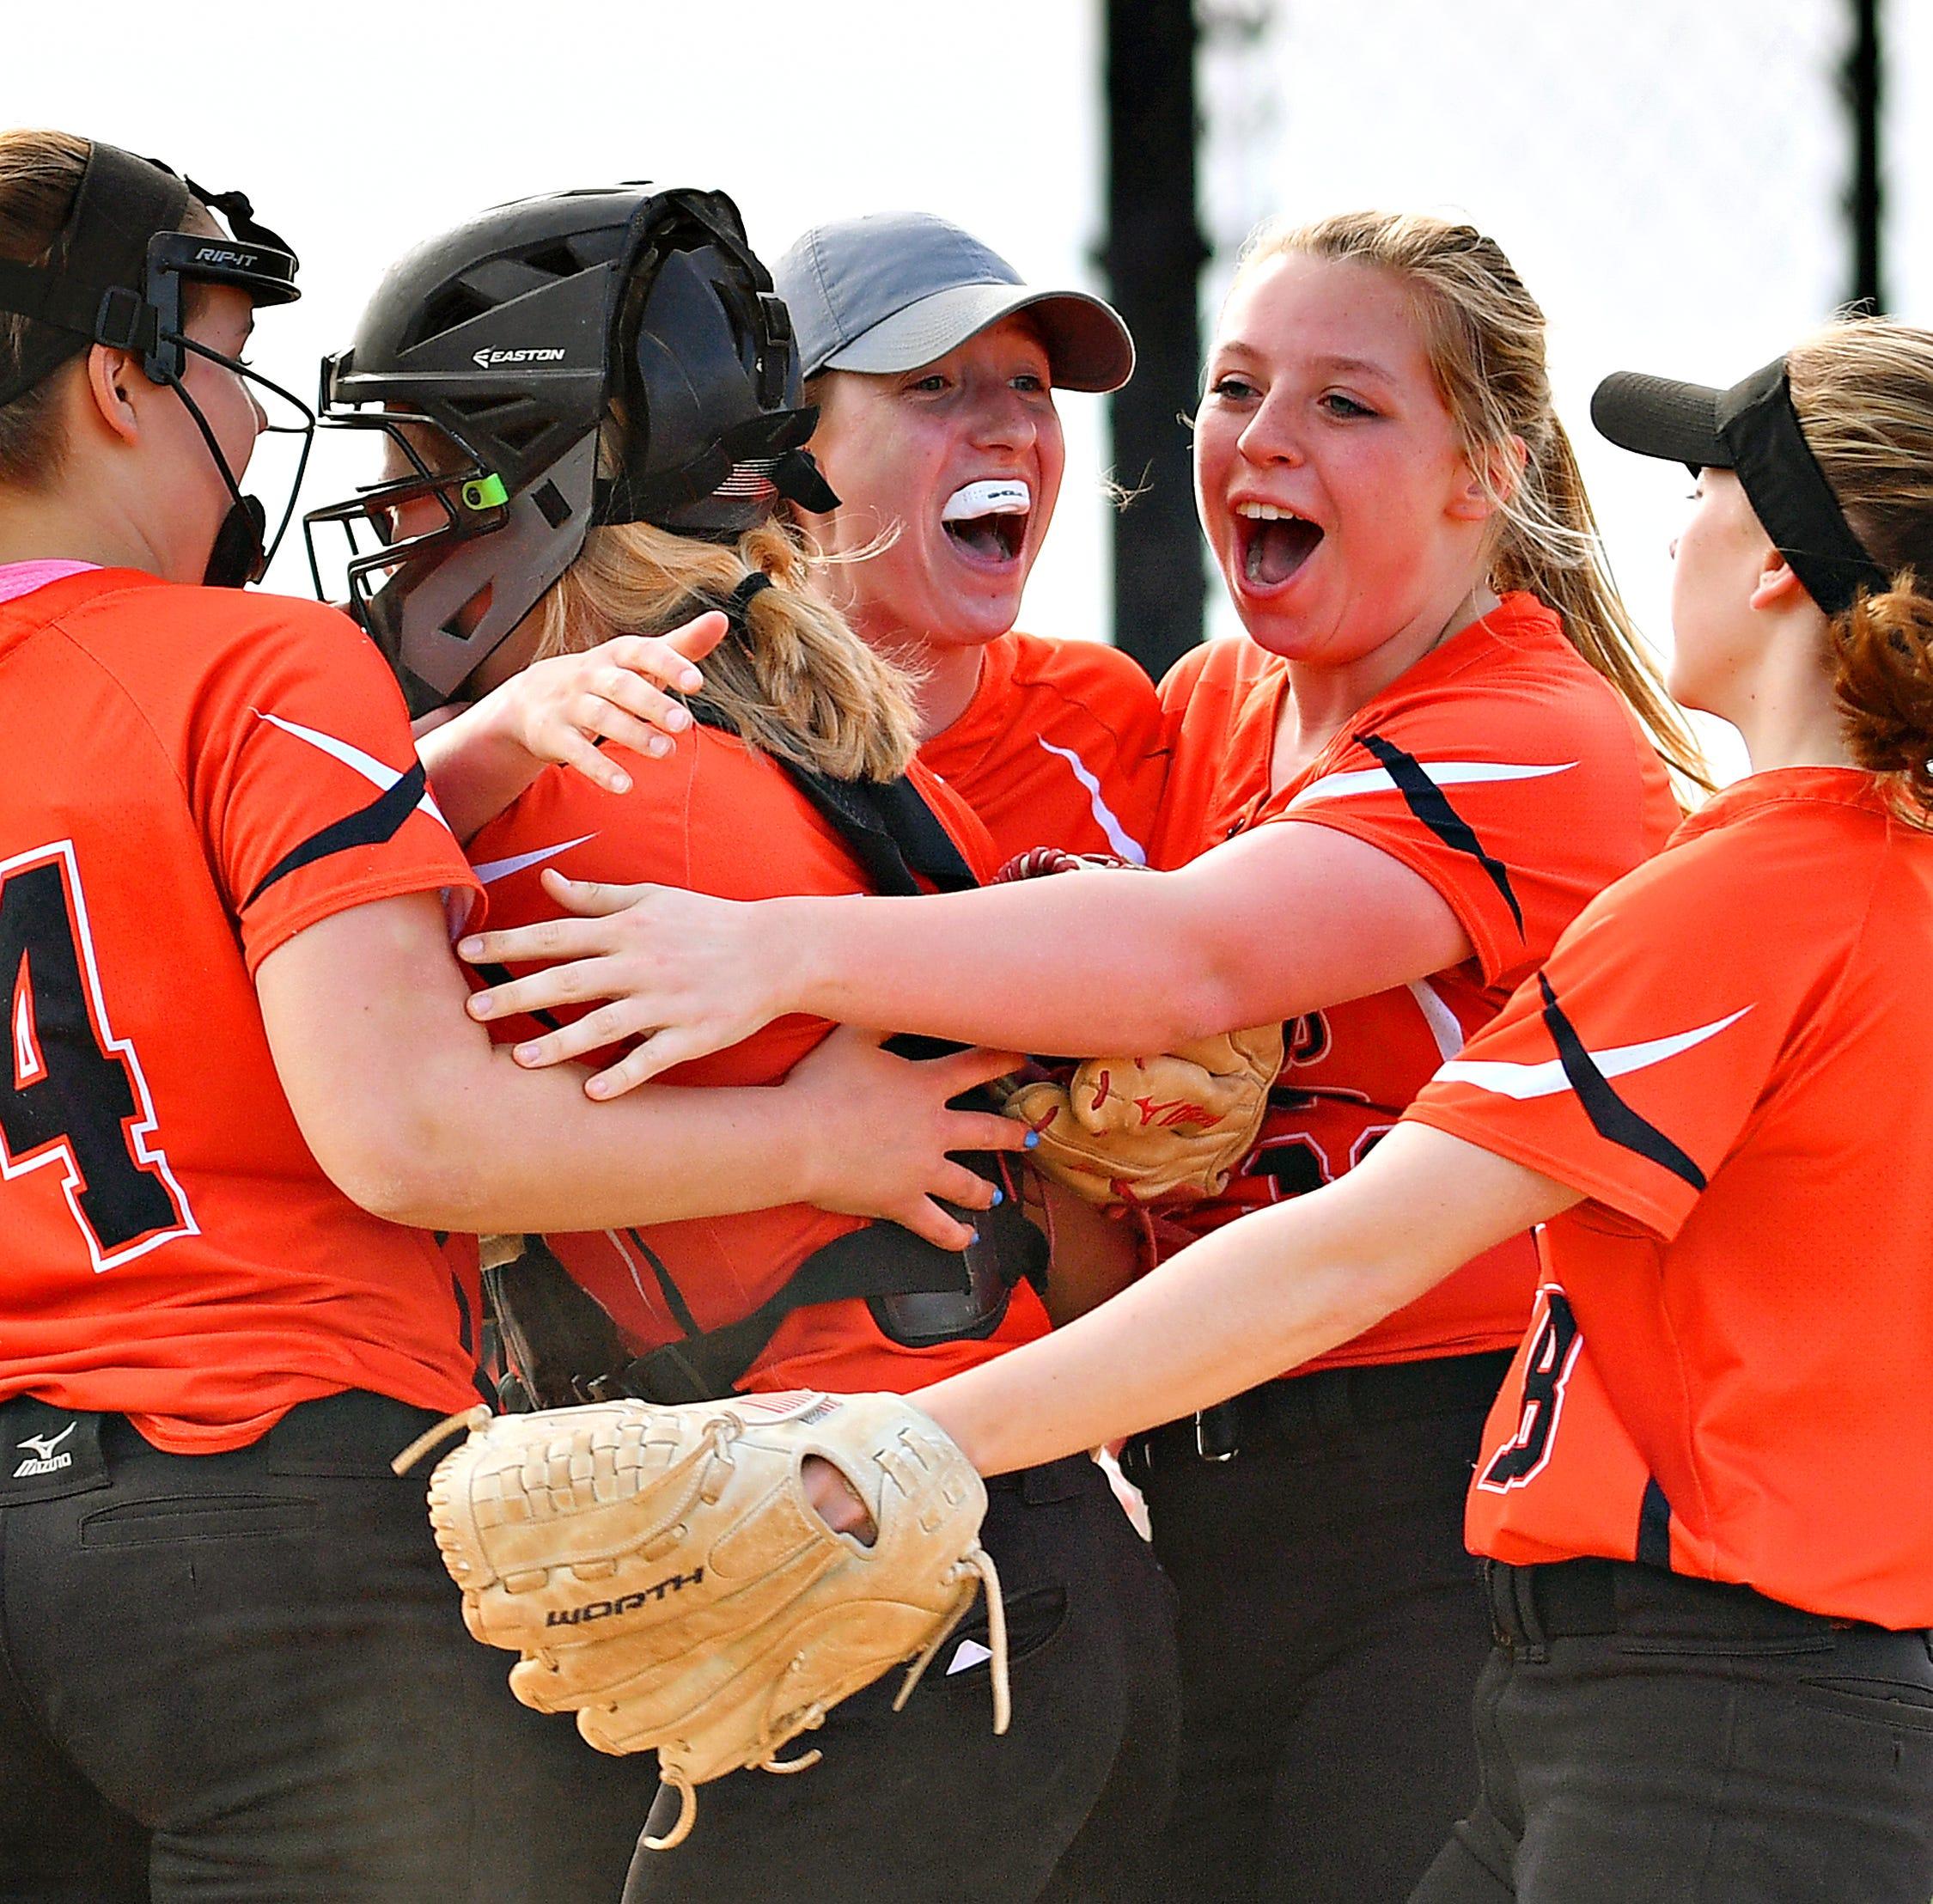 PREP ROUNDUP, WEDNESDAY, APRIL 24: Northeastern edges Central York for key softball win